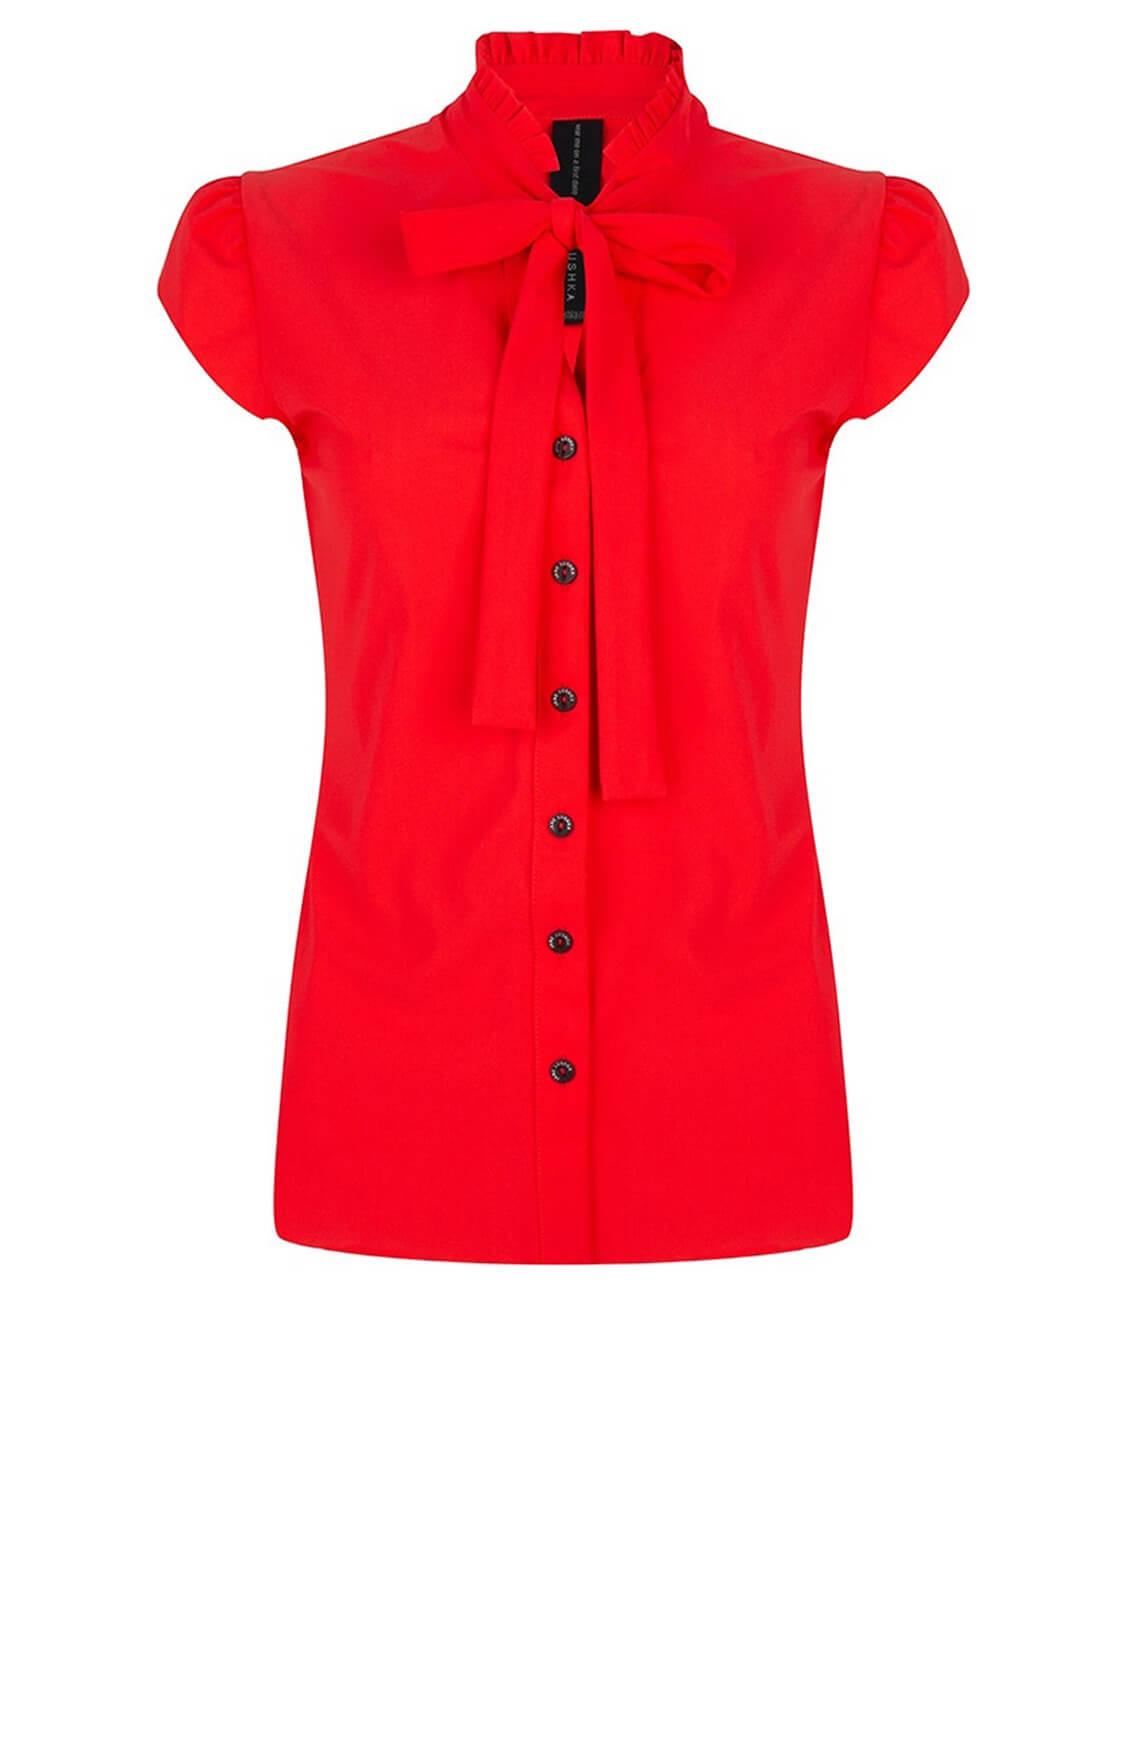 Jane Lushka Dames Tash blouse met strik Rood